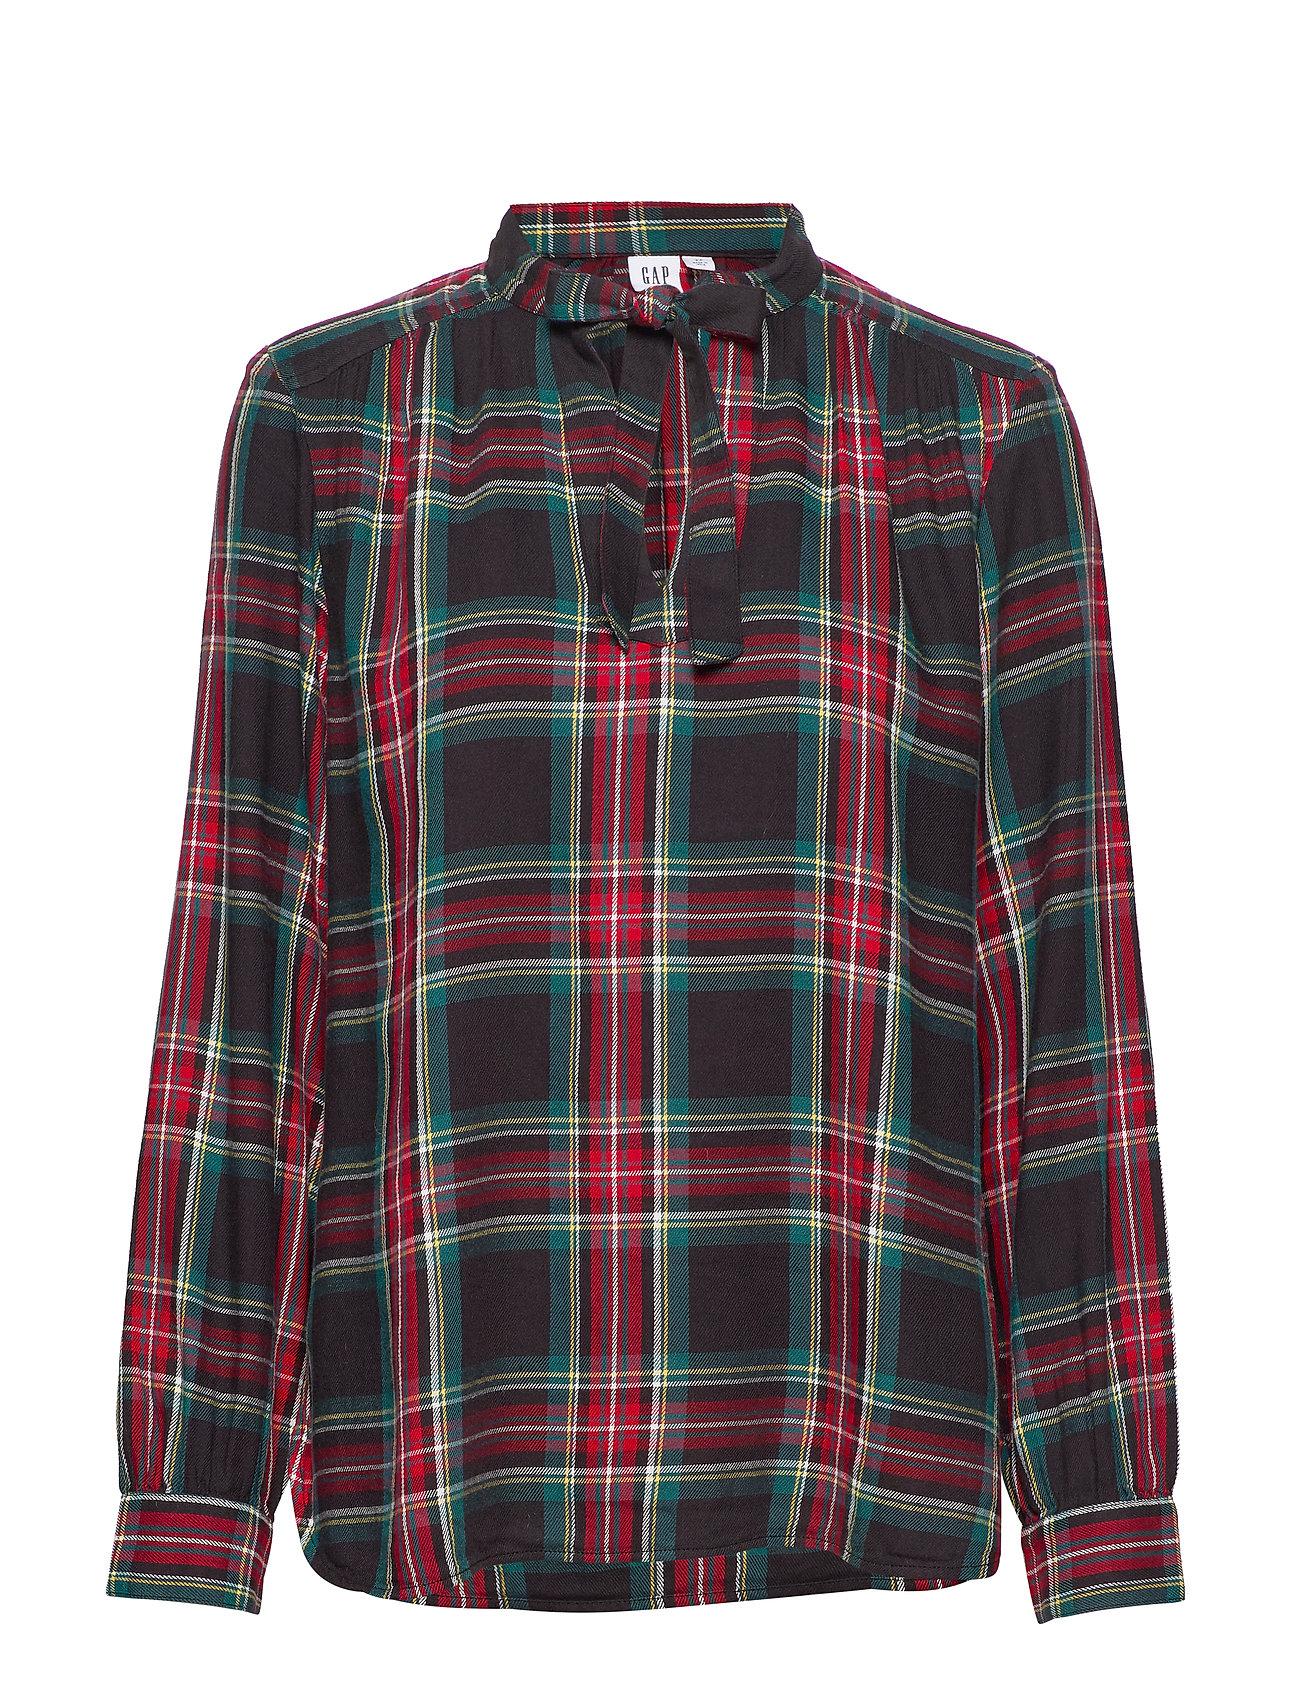 GAP Plaid Tie-Neck Blouse - RED TARTAN PLAID